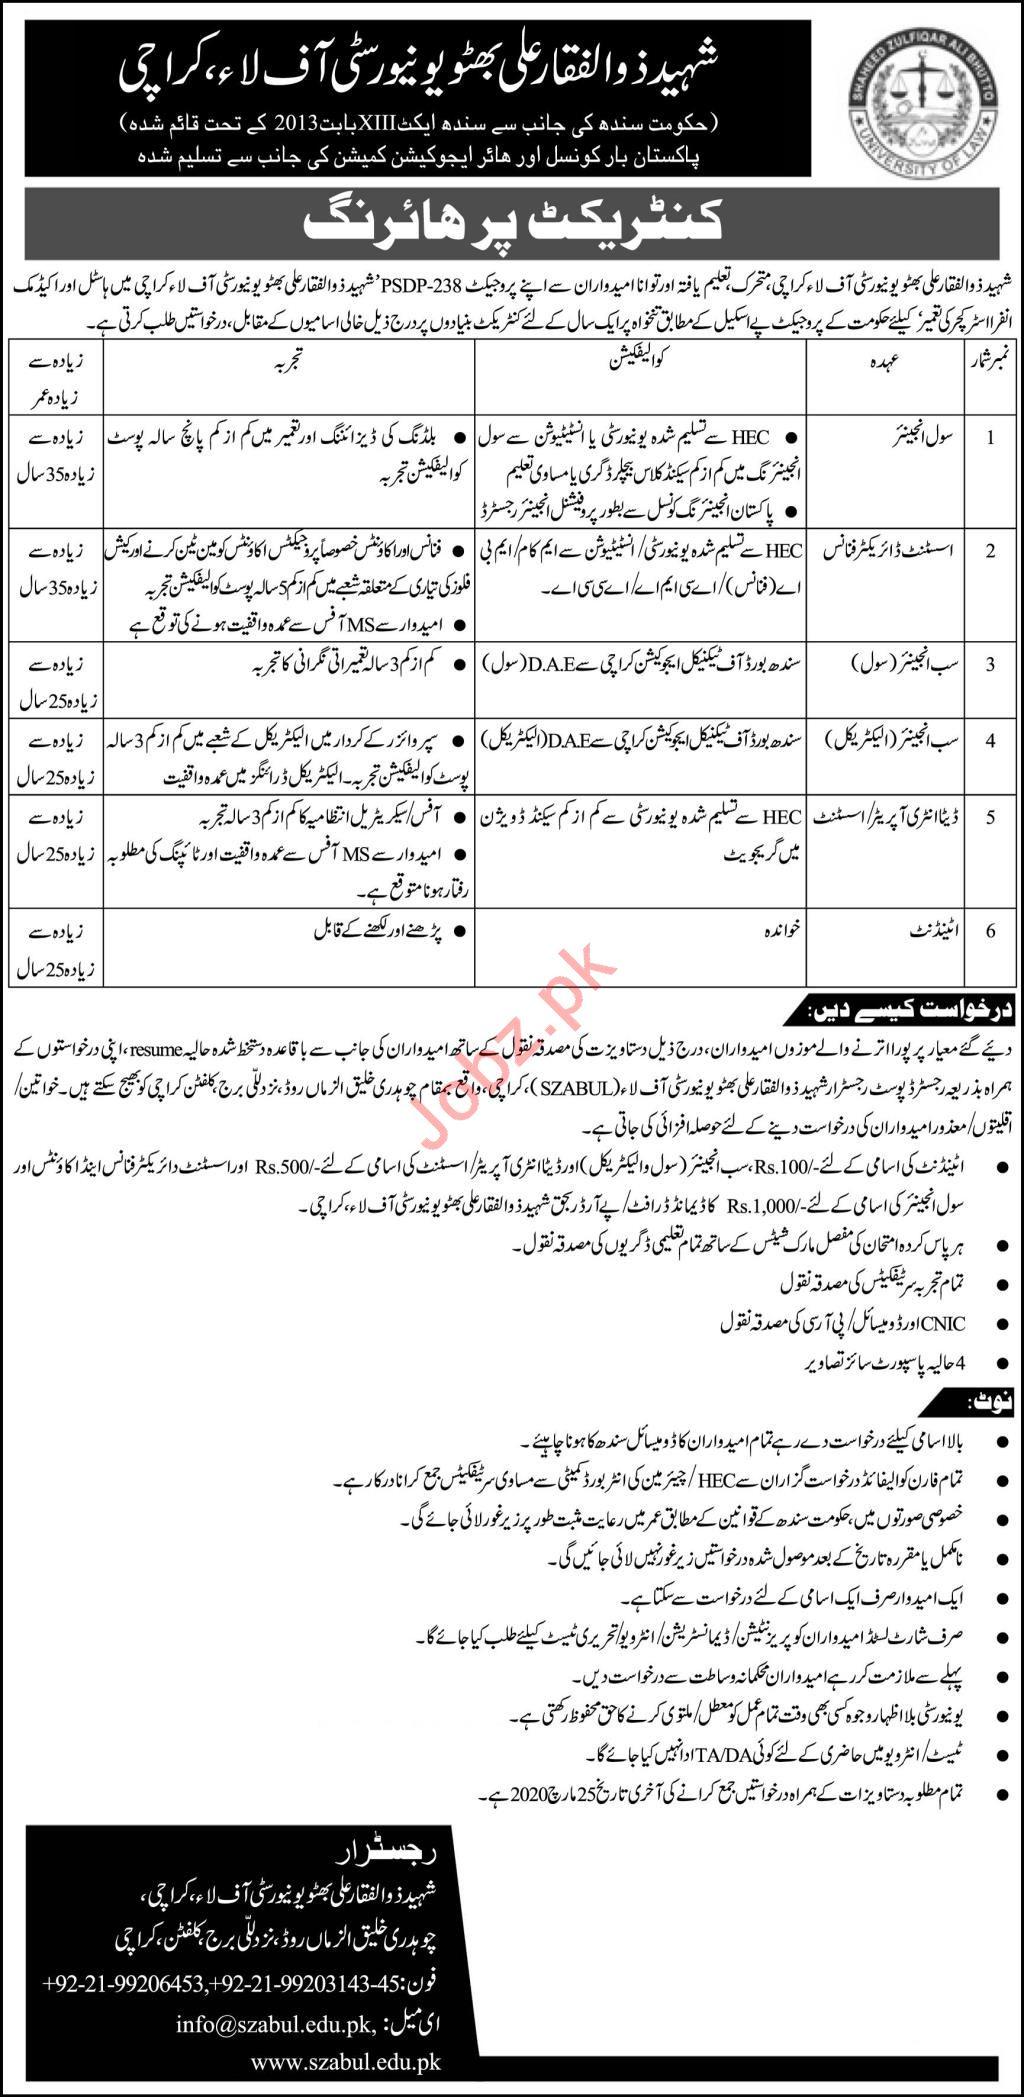 Shaheed Zulfiqar Ali Bhutto University of Law Jobs 2020